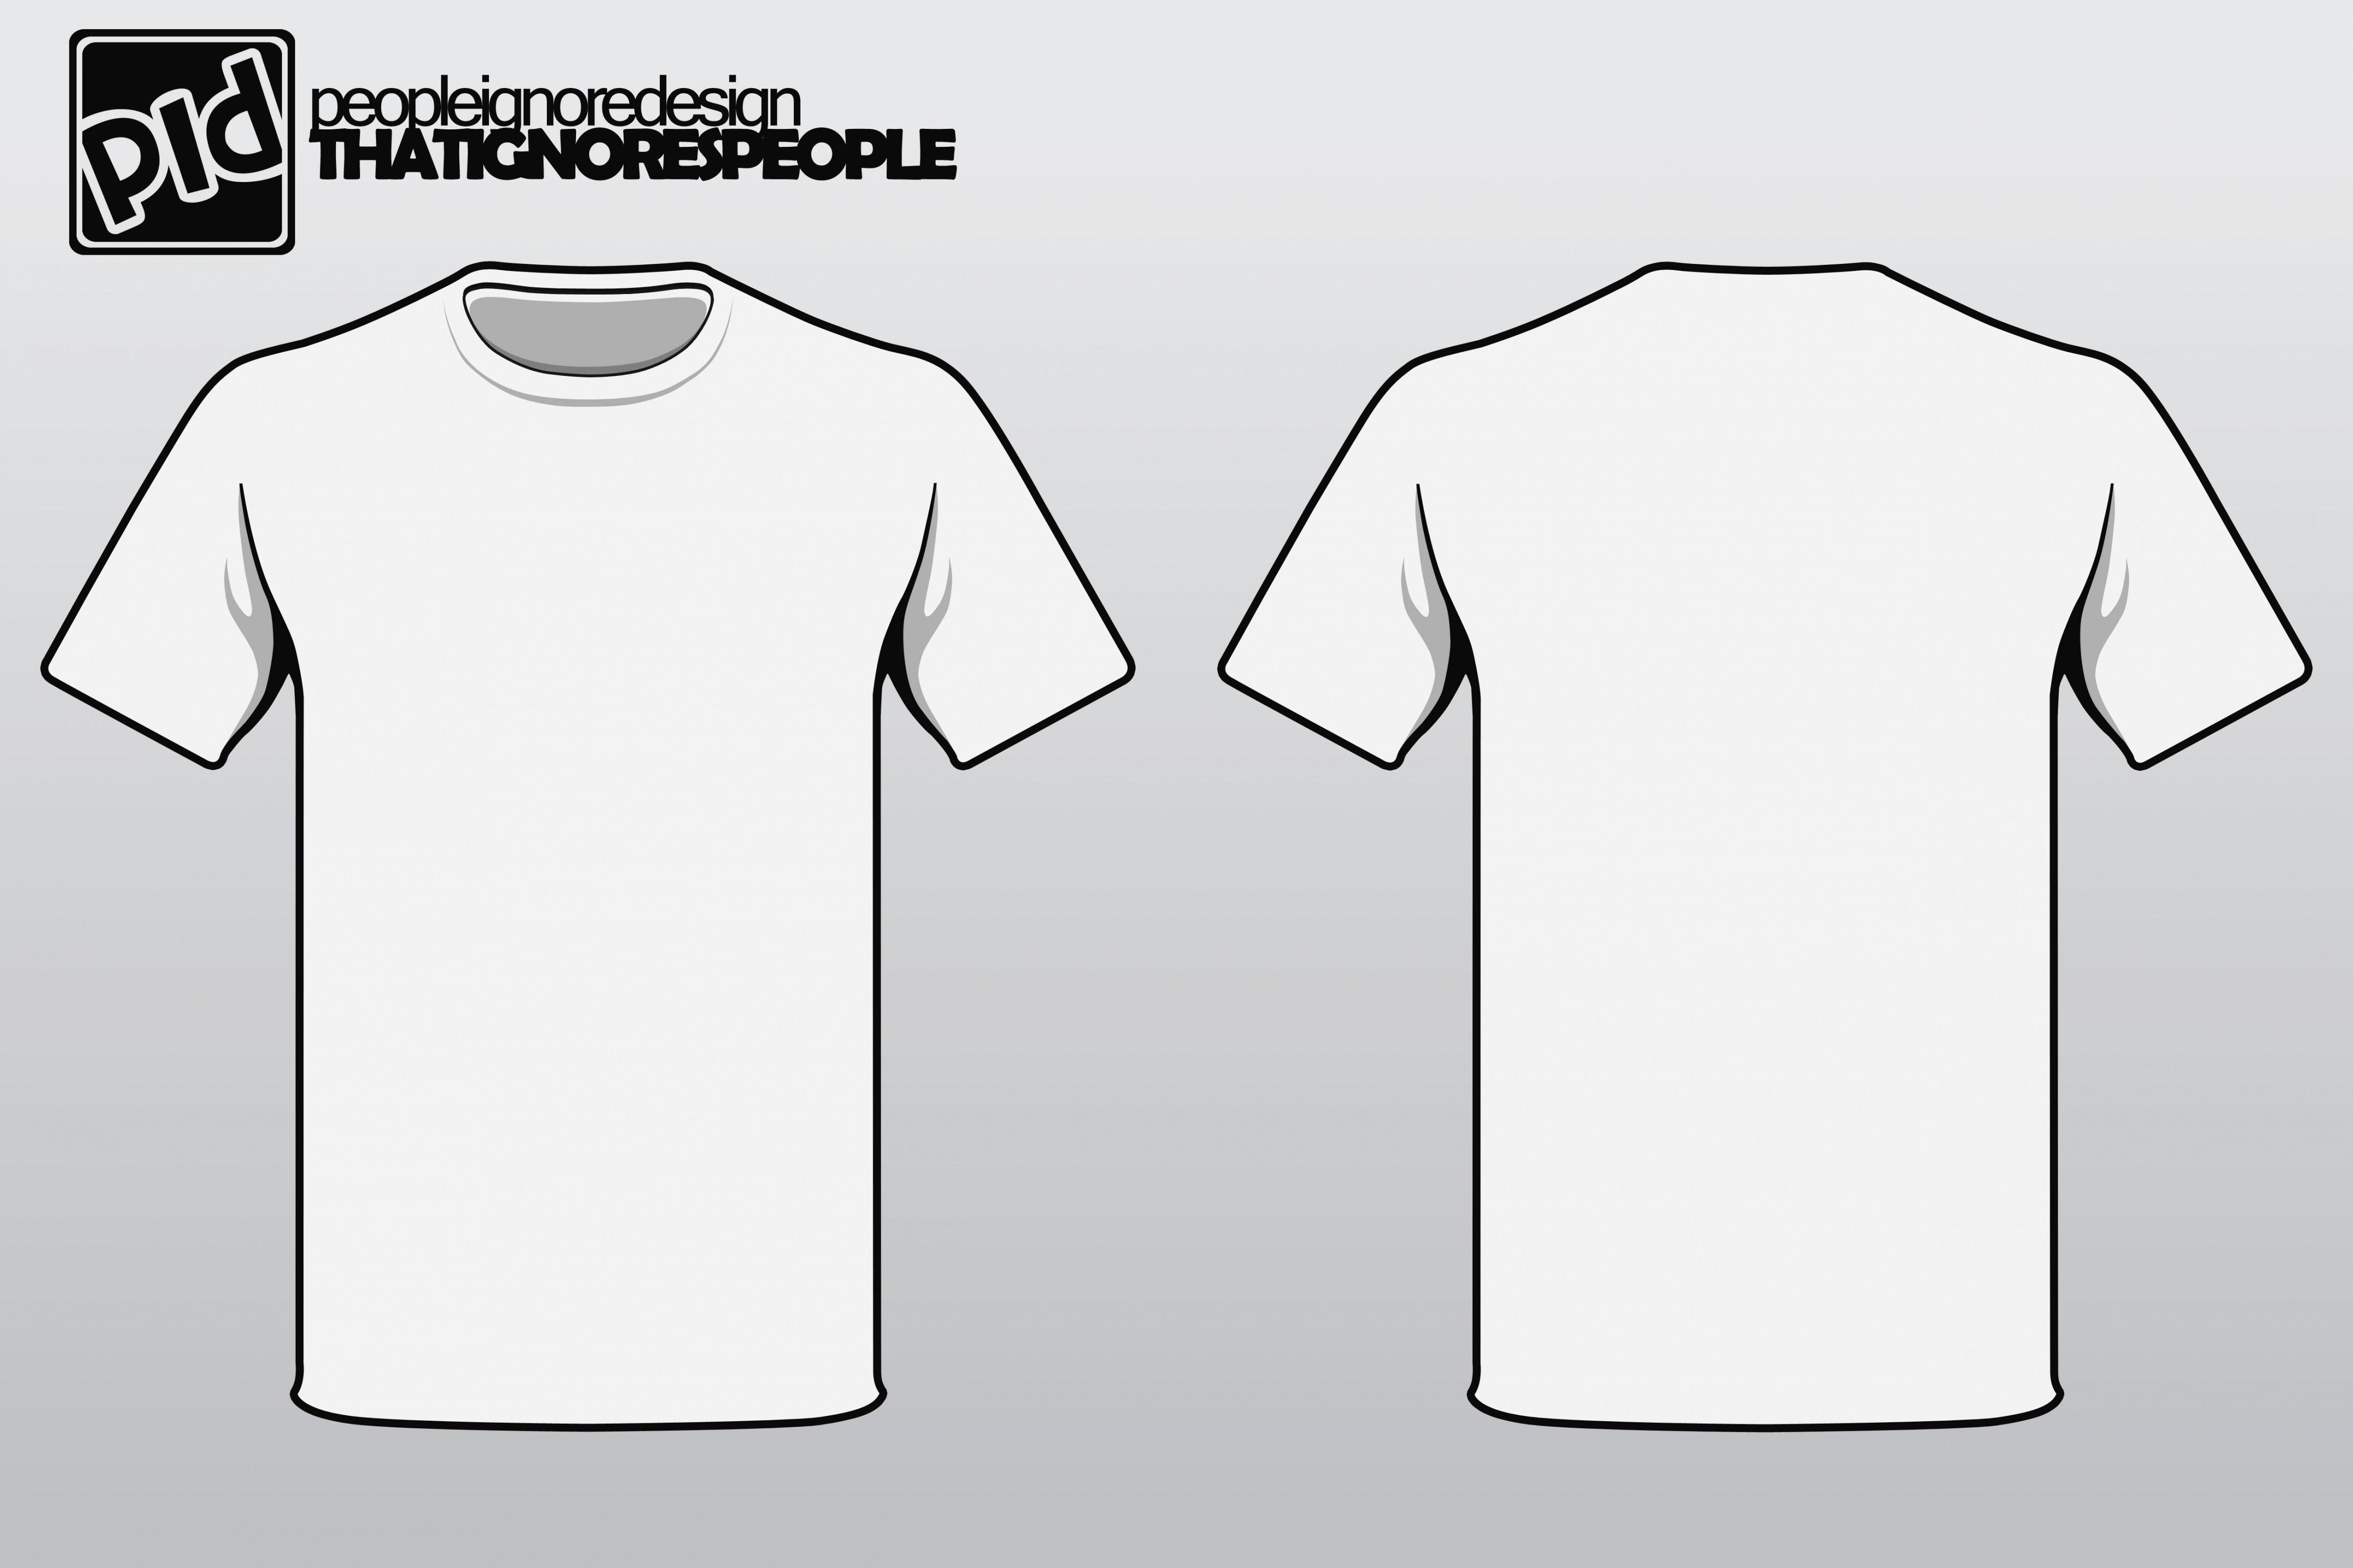 Free Blank Shirt Template Psd « Alzheimer's Network Of Oregon Intended For Blank T Shirt Design Template Psd